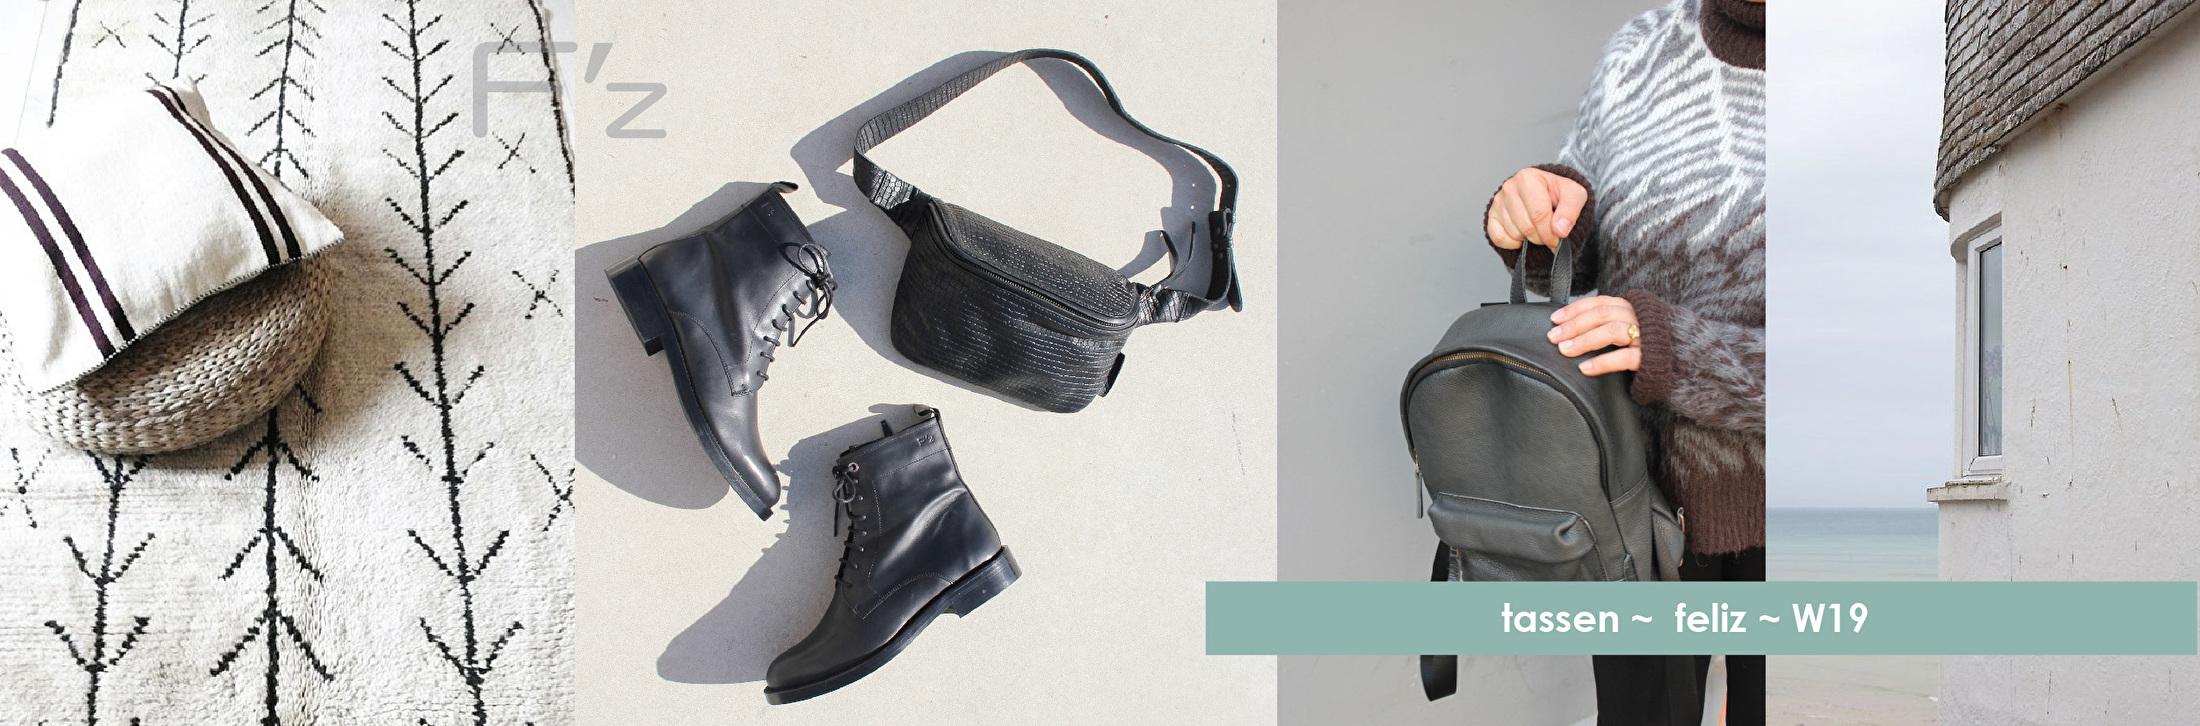 Tassen FELIZ winter 19 bags shoppers bumbag rugzak